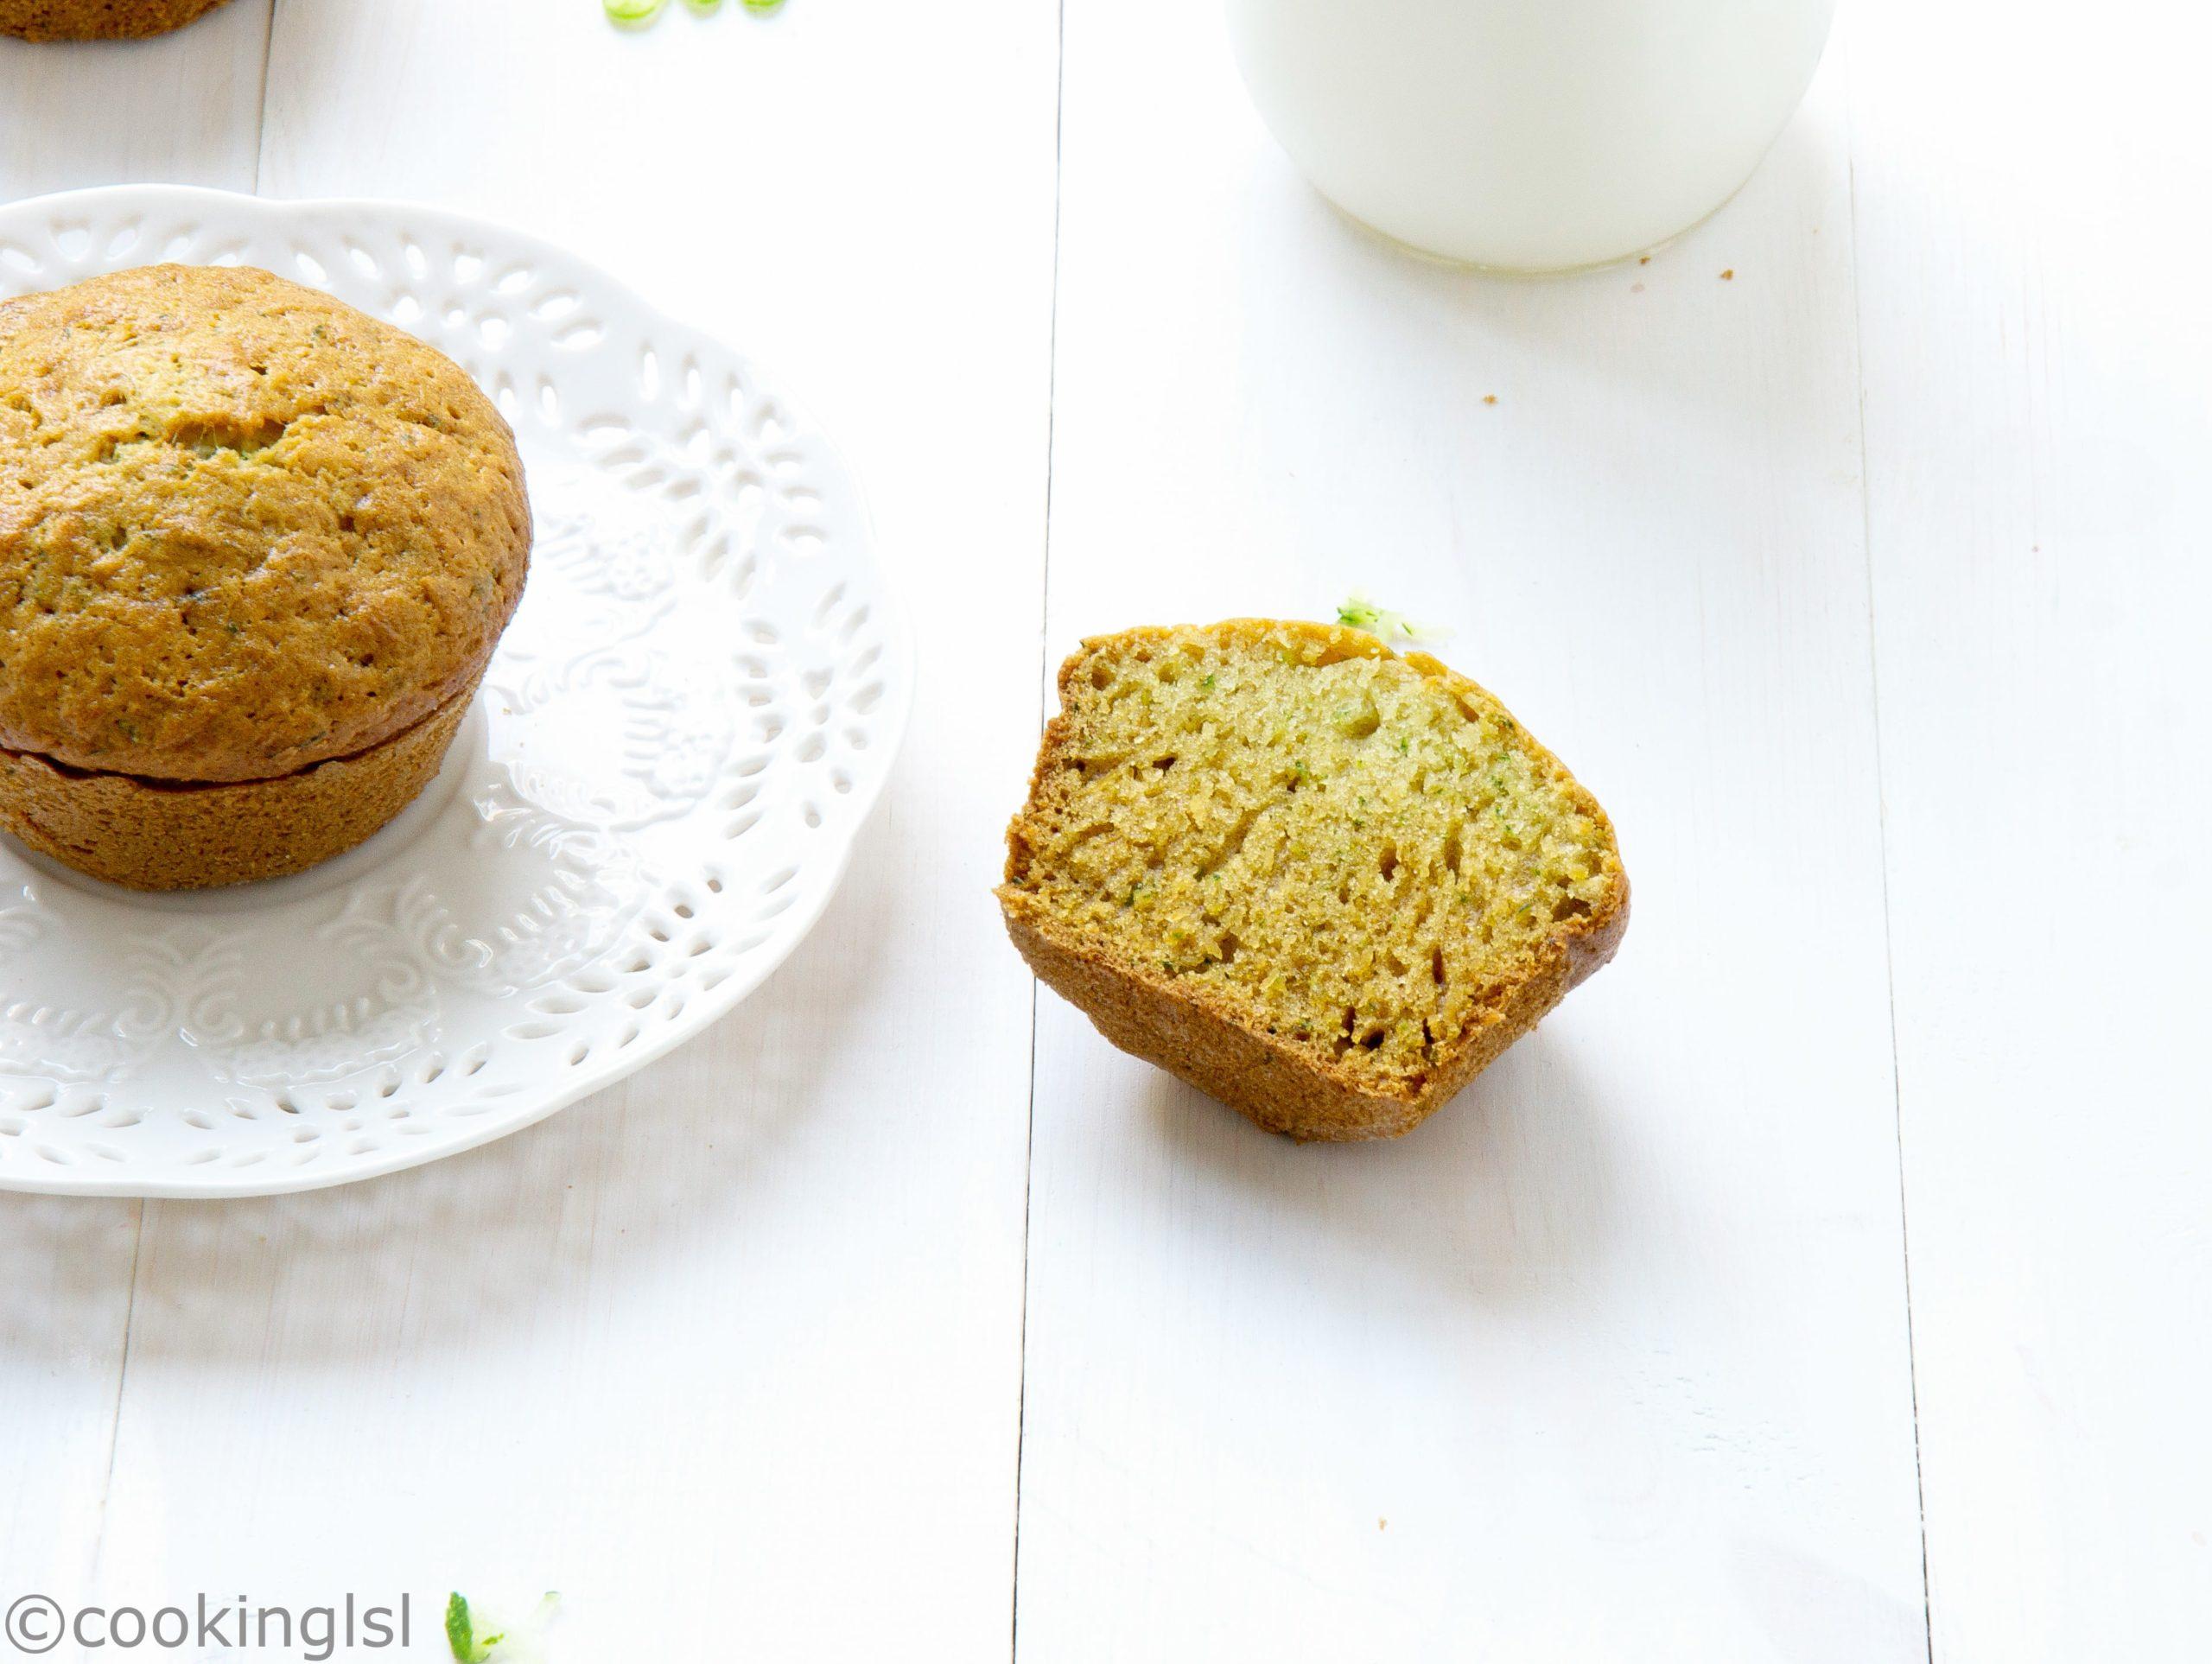 zucchini-muffins-healthy-inside-shot